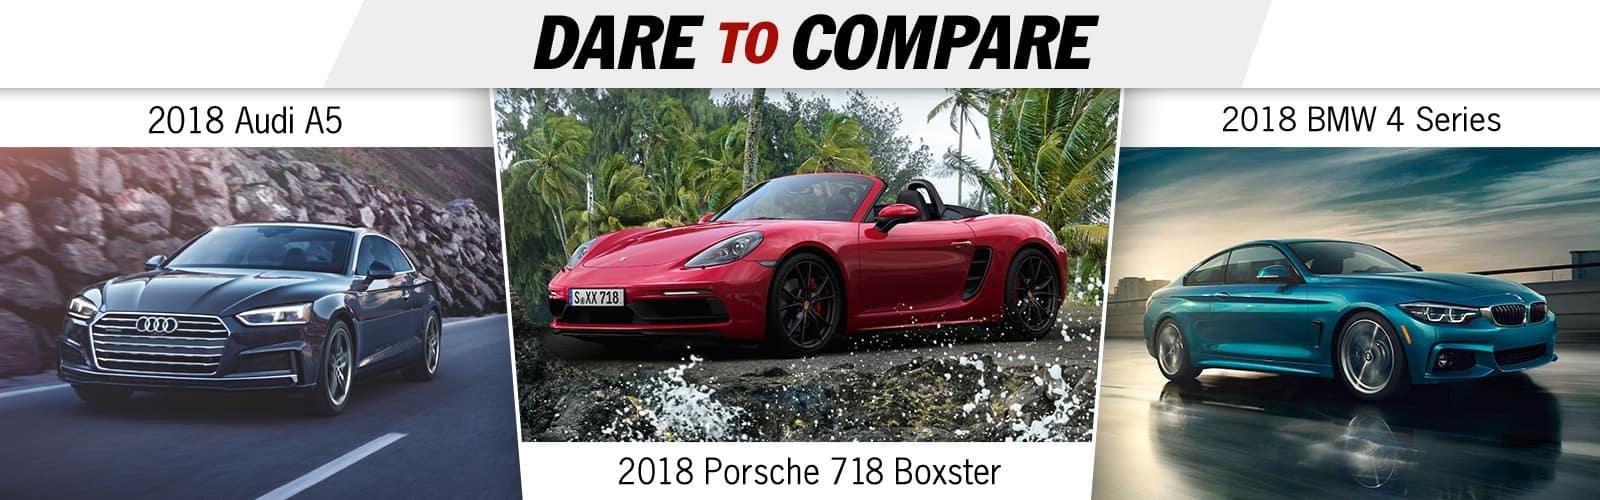 2018 Porsche 718 Boxster vs. Audi A5 vs. BMW 4 Series